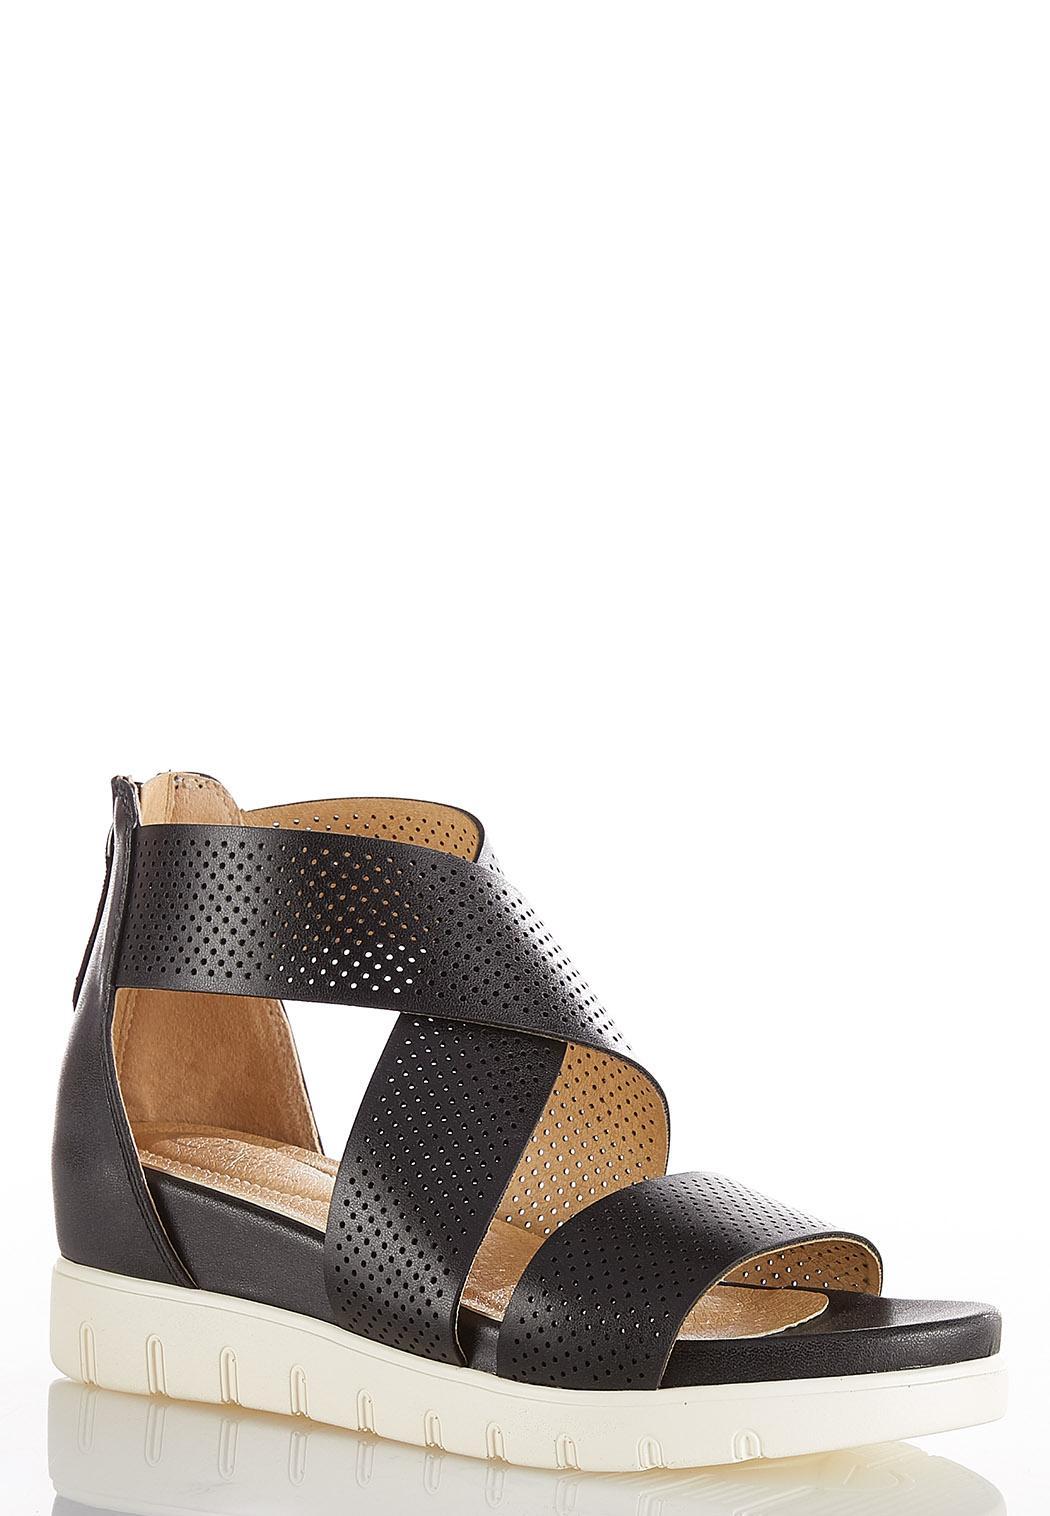 Laser Cut Flatform Sandals